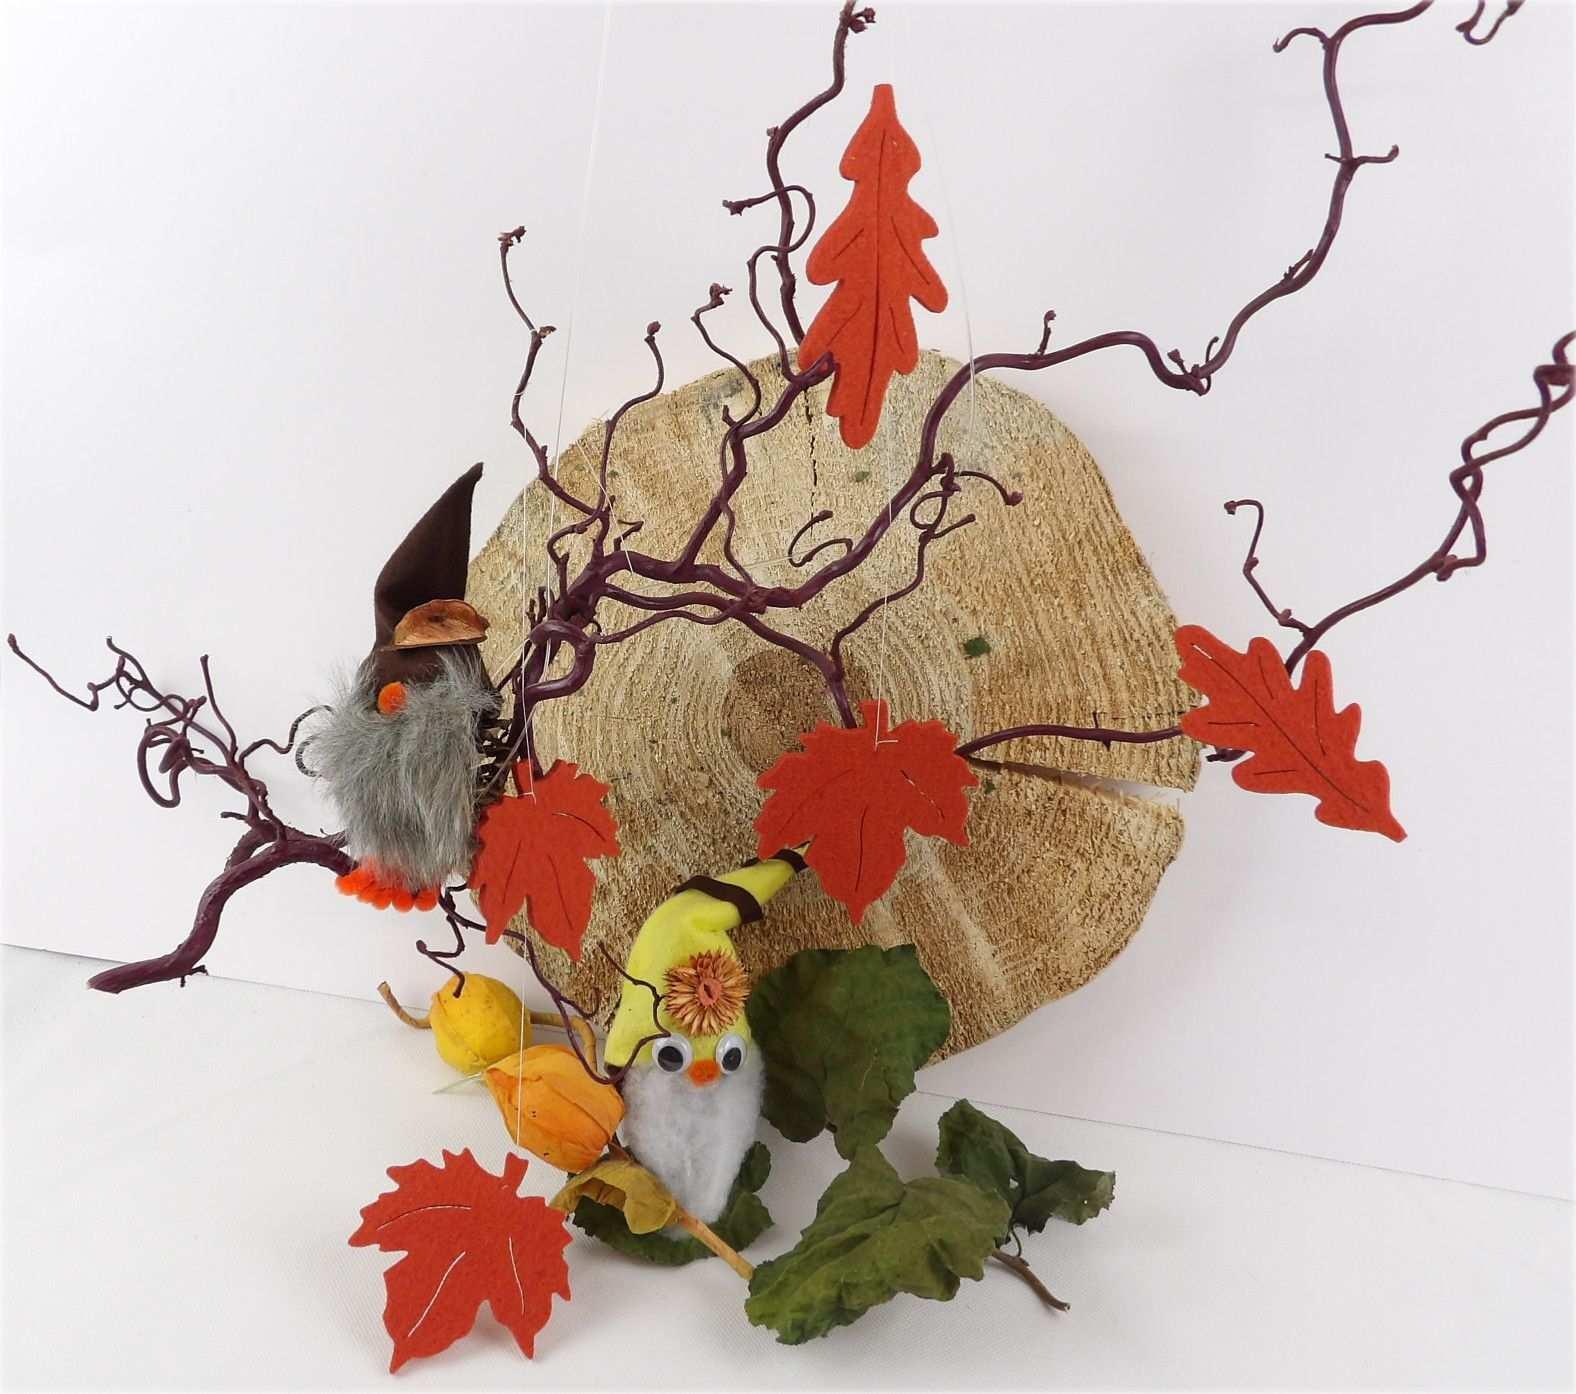 Herbstdeko Basteln Mit Filz Basteln Kreativ Basteln Mit Filz